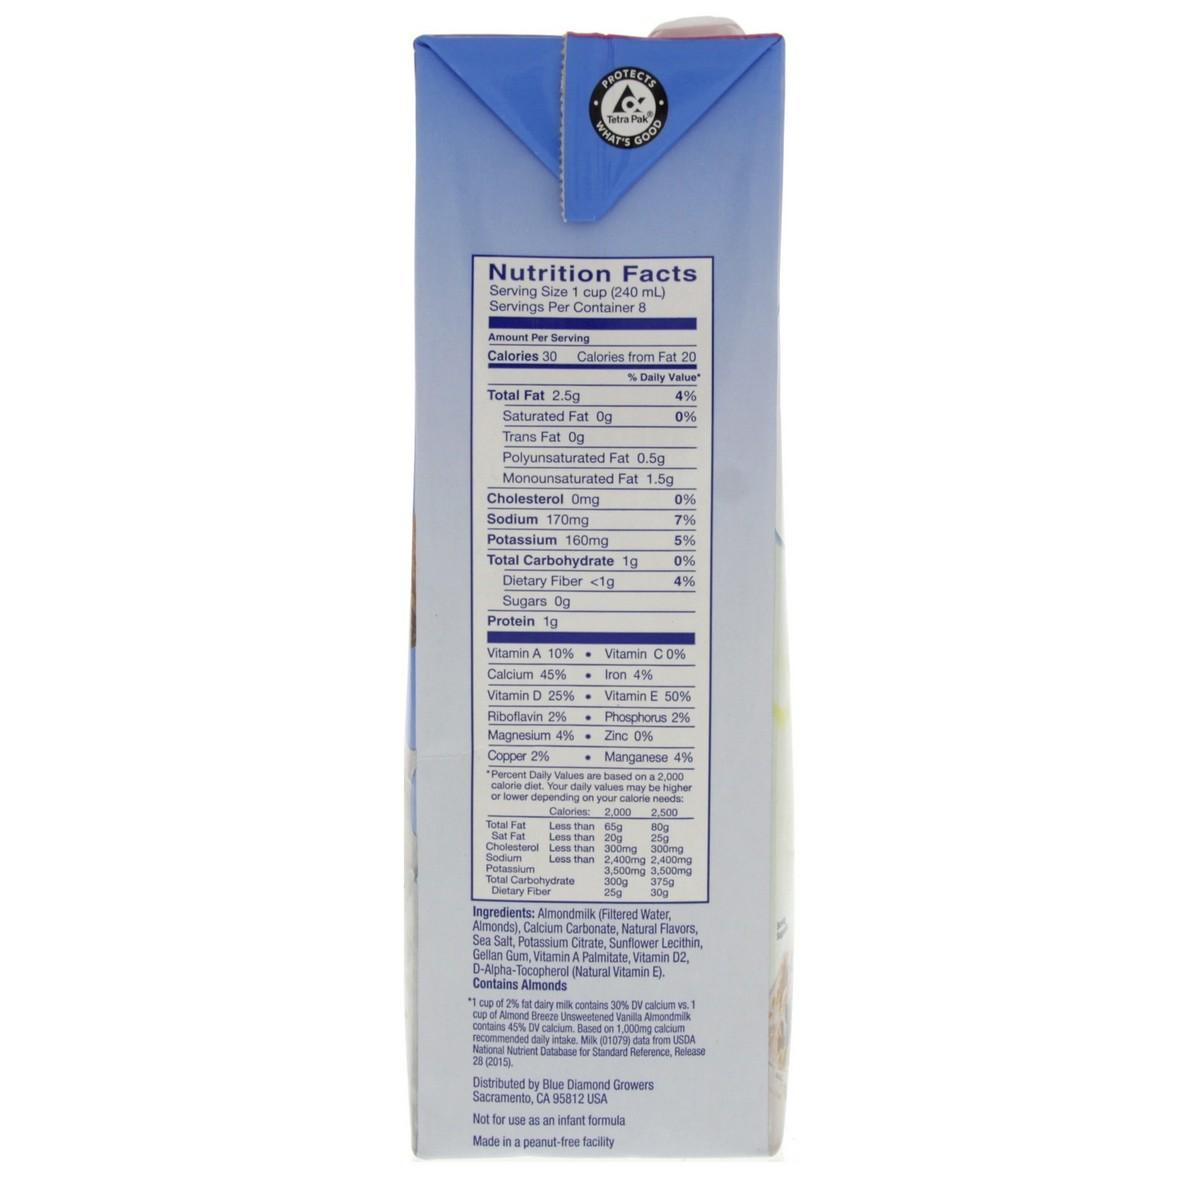 Buy Blue Diamond Almond Breeze